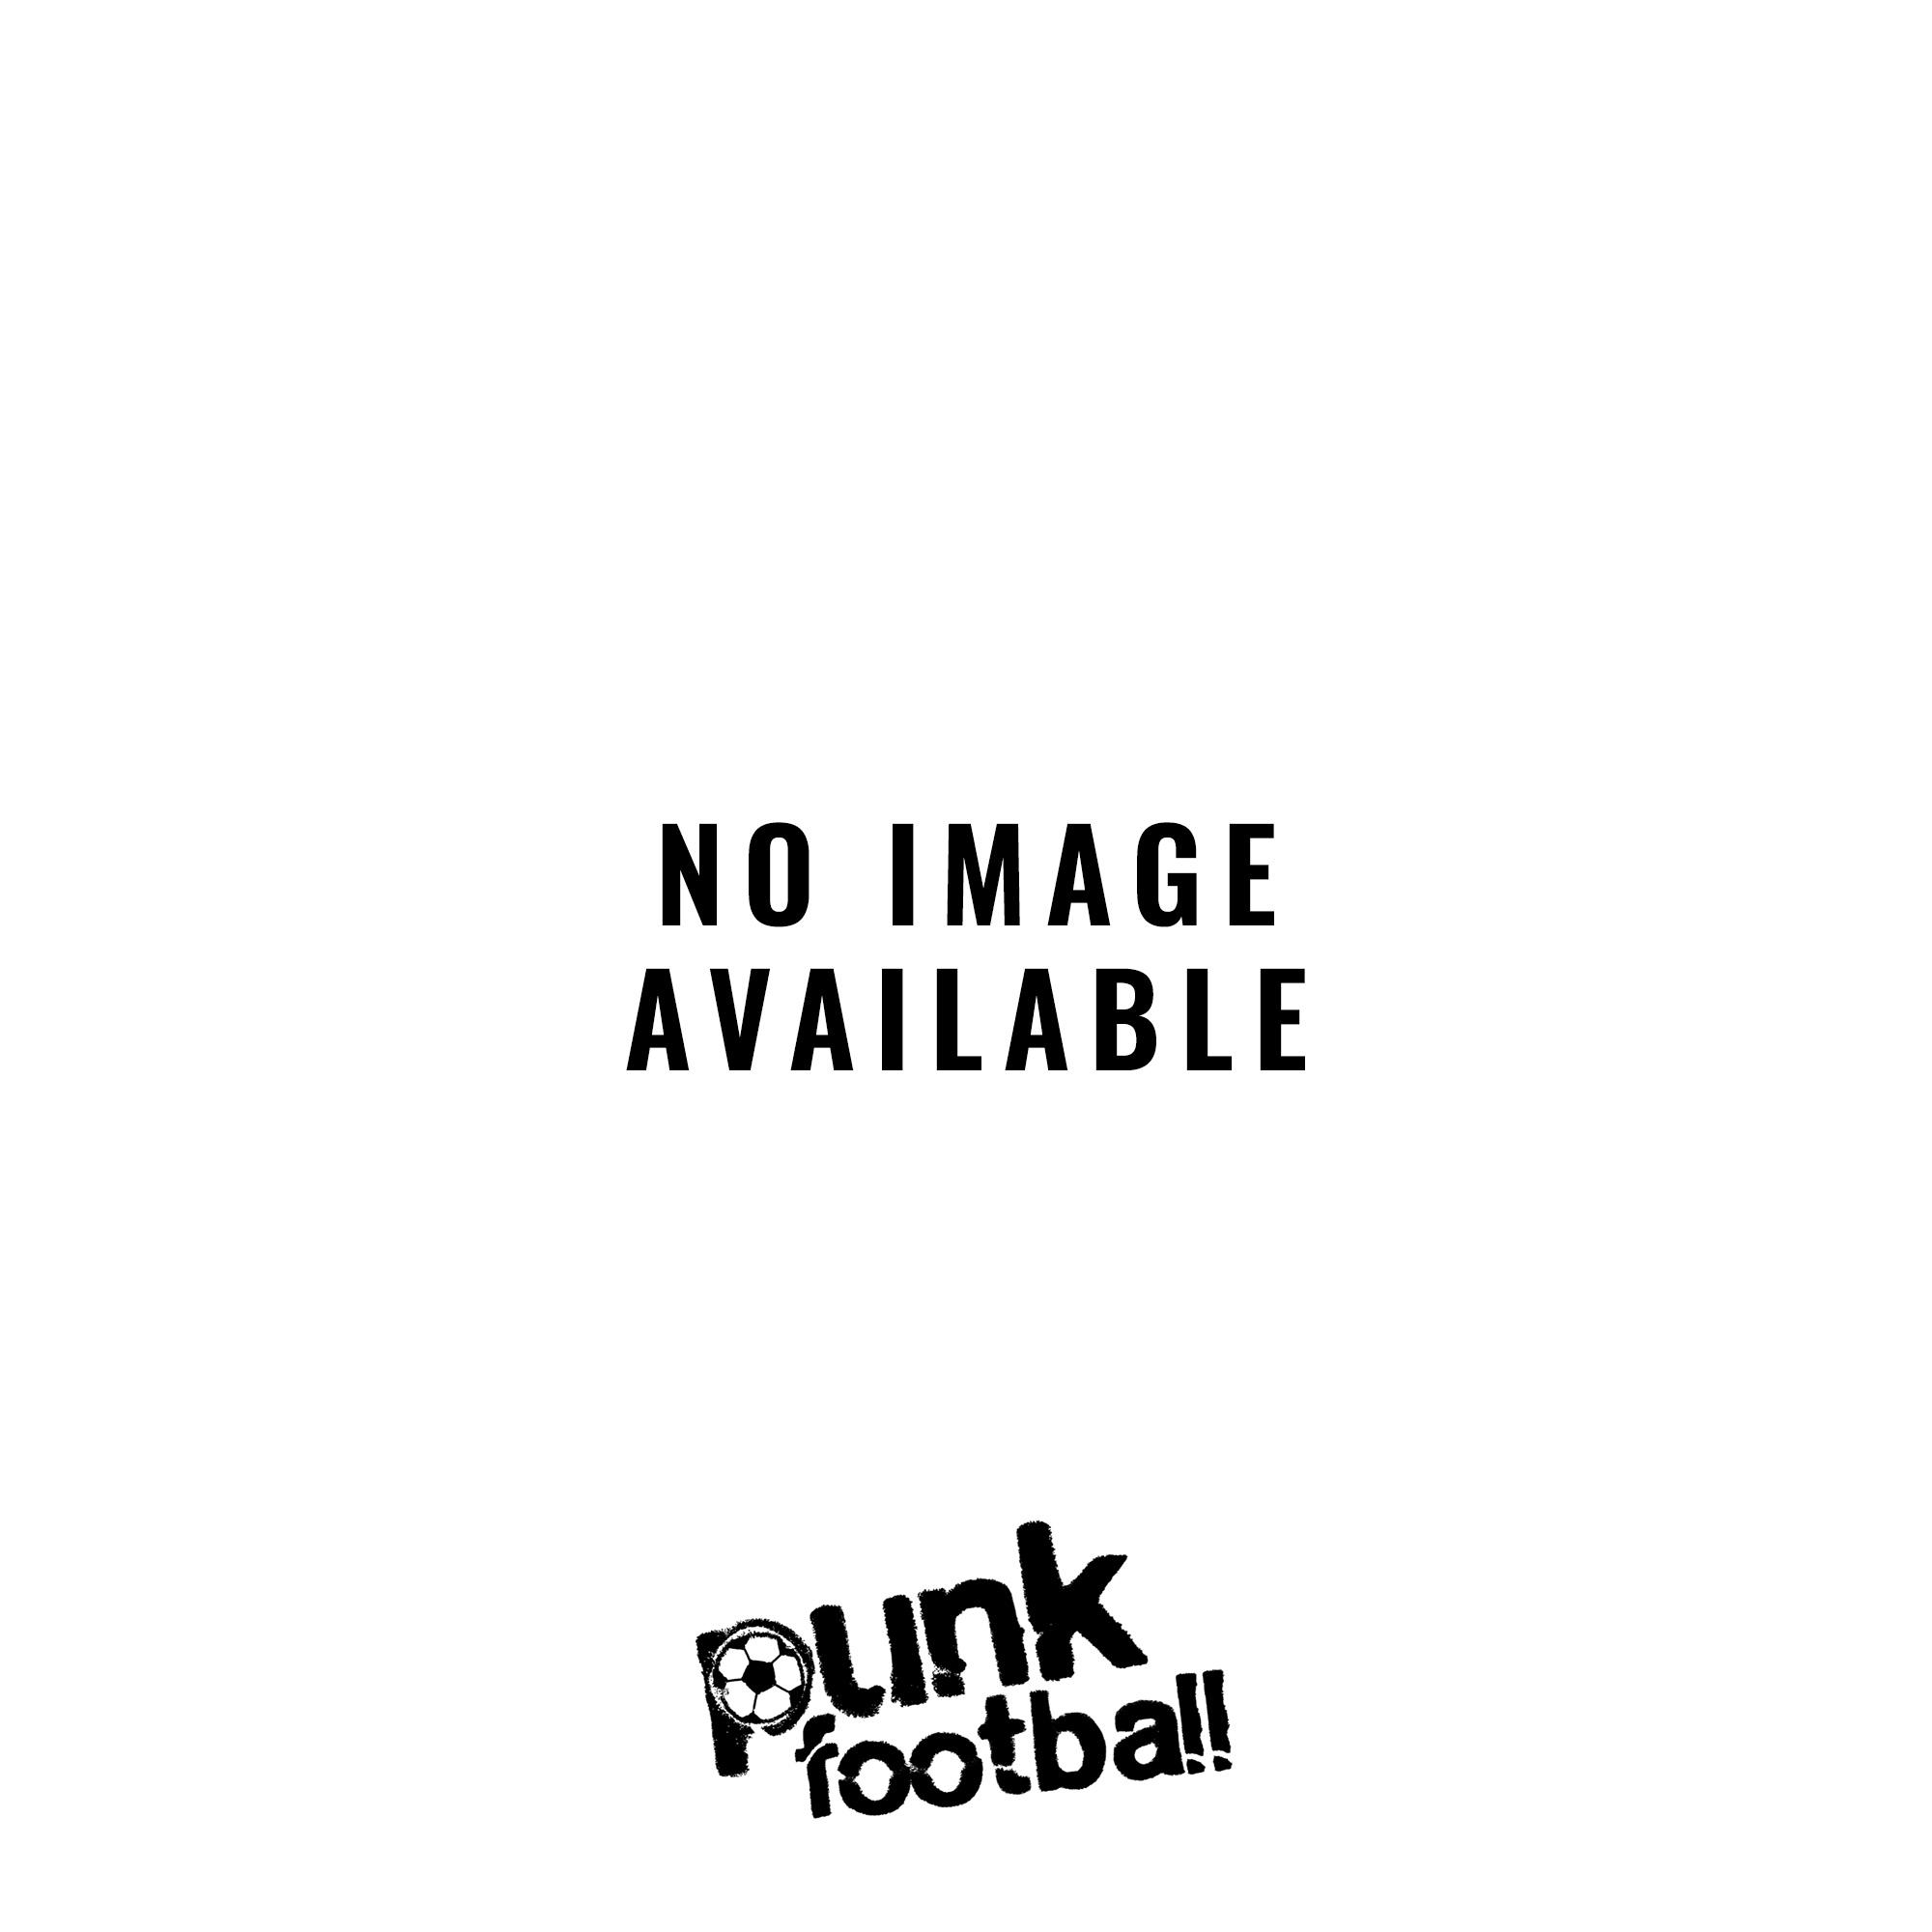 bfdd5723 West Ham Boys Club (As Worn By Morrissey, The Smiths) T-Shirt